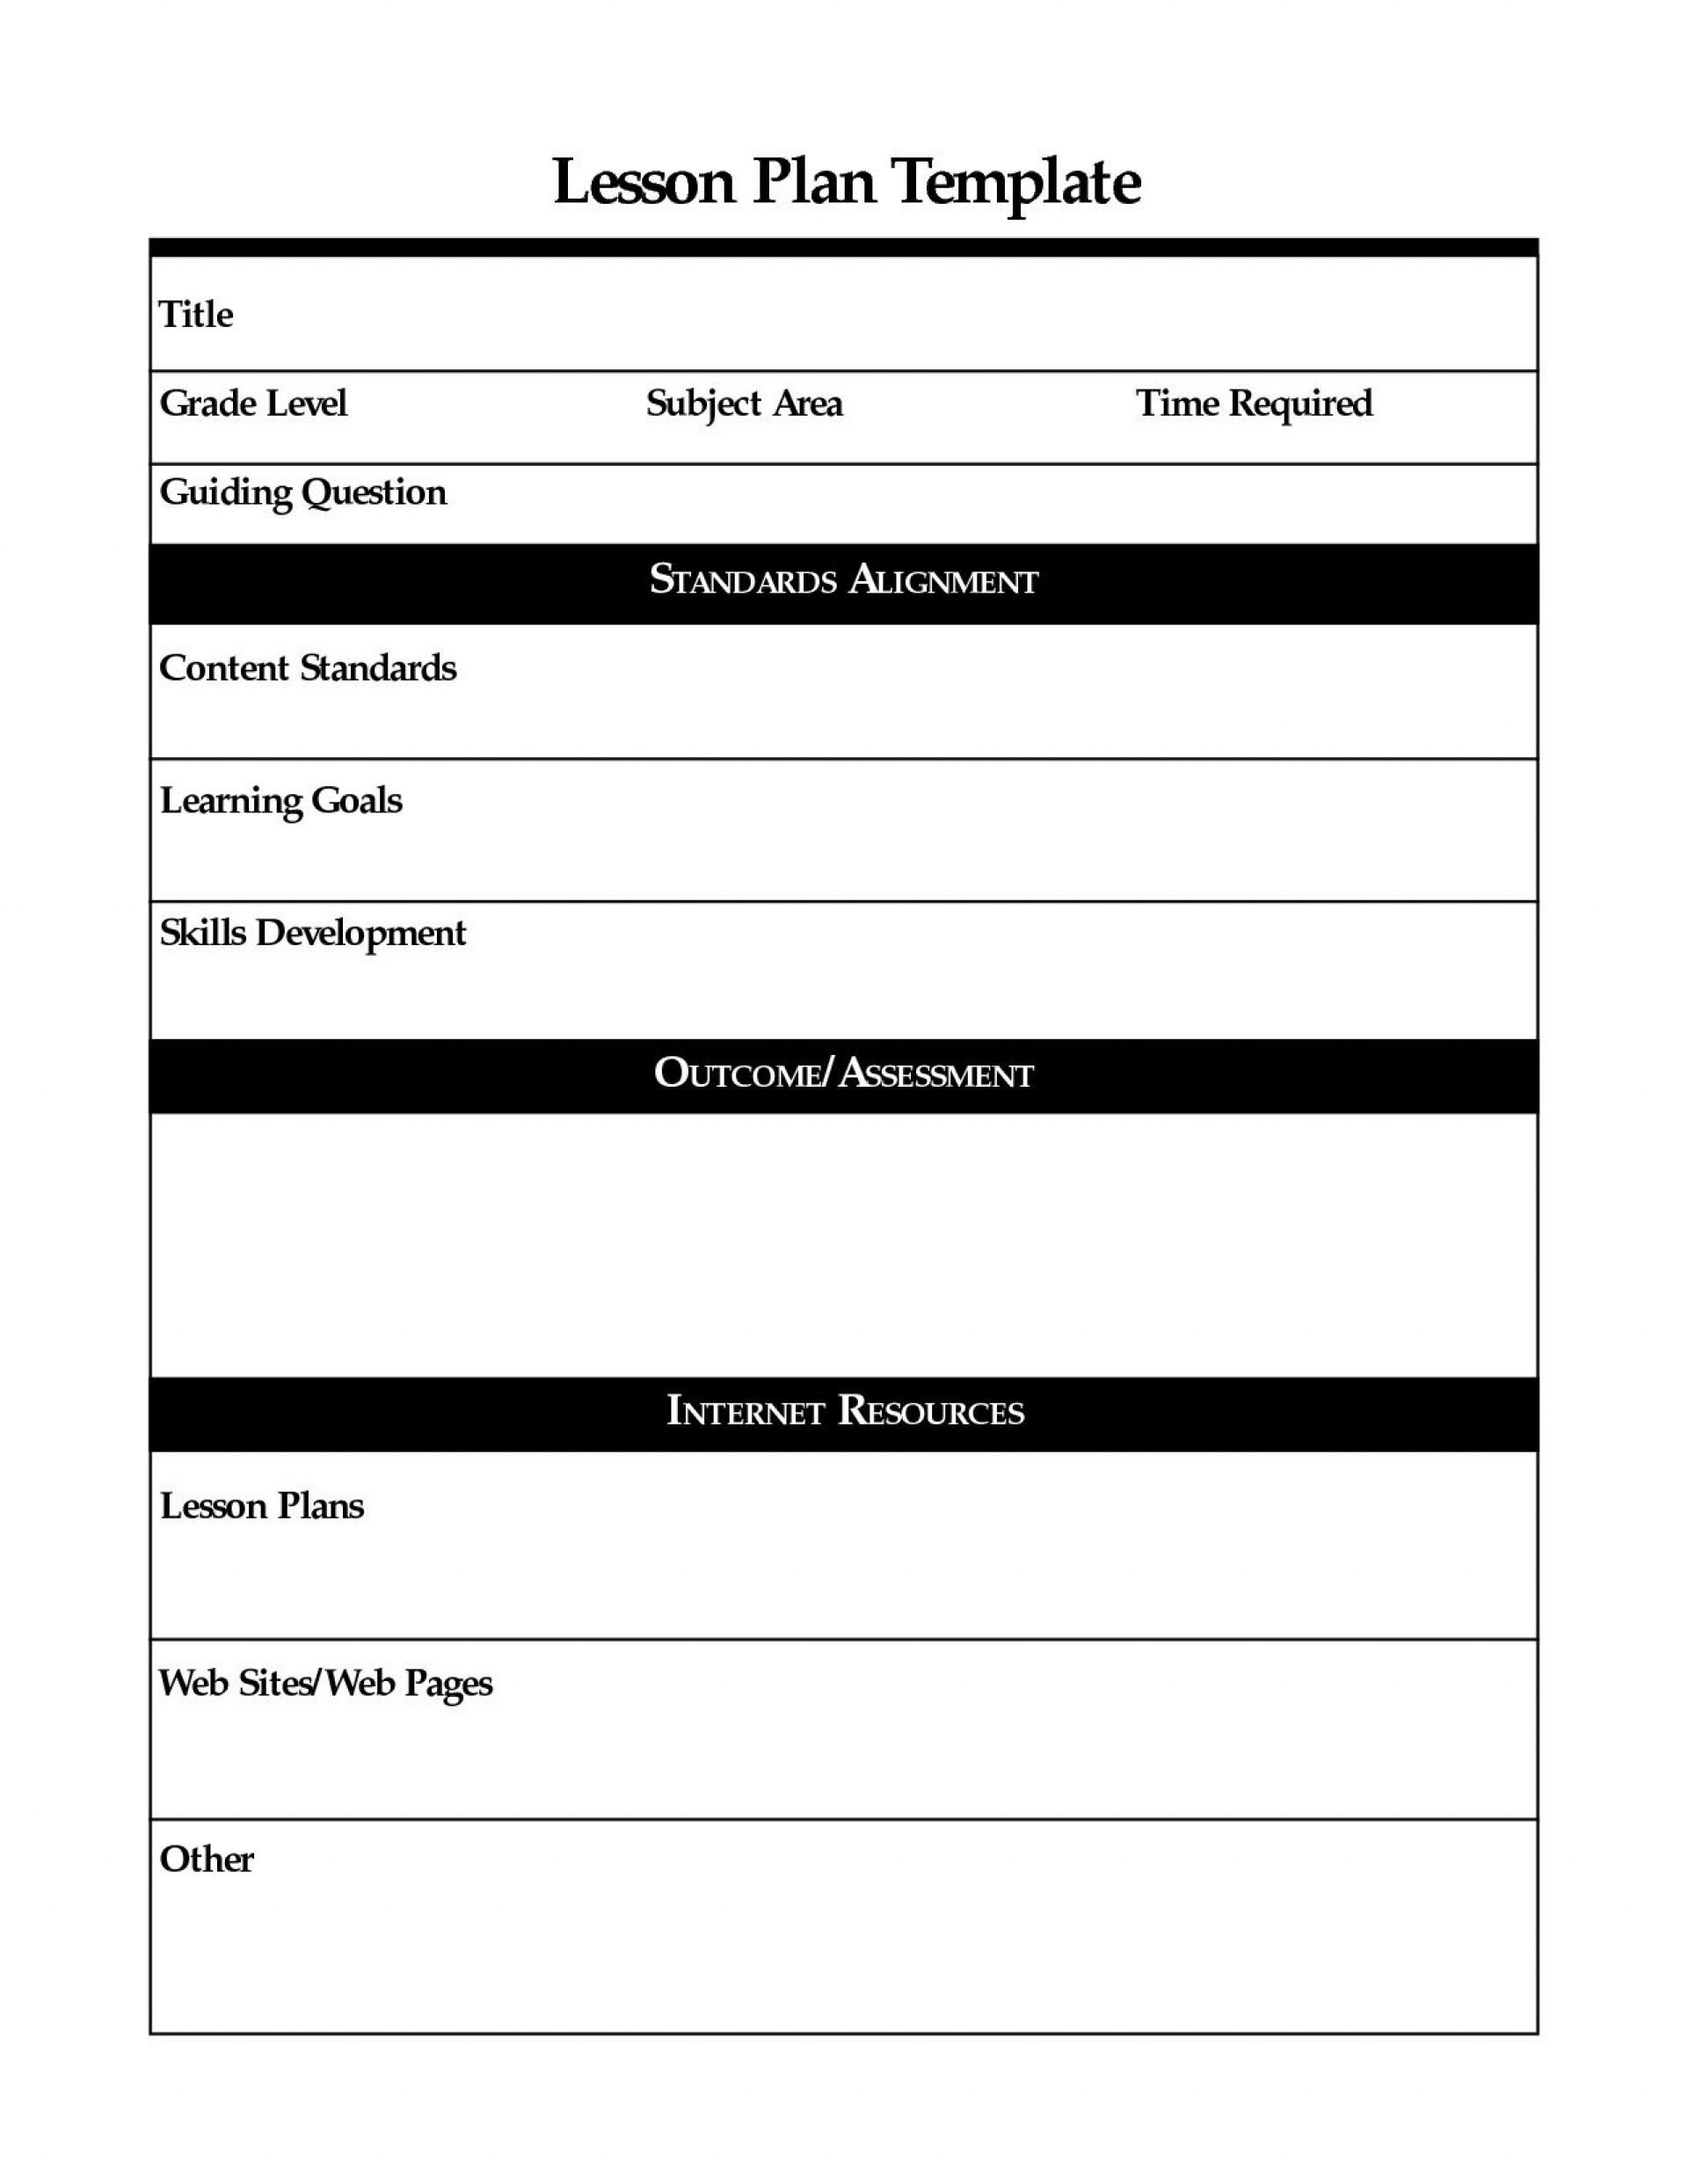 001 Wondrou Free Printable Lesson Plan Template Inspiration  Preschool Weekly For Kindergarten1920